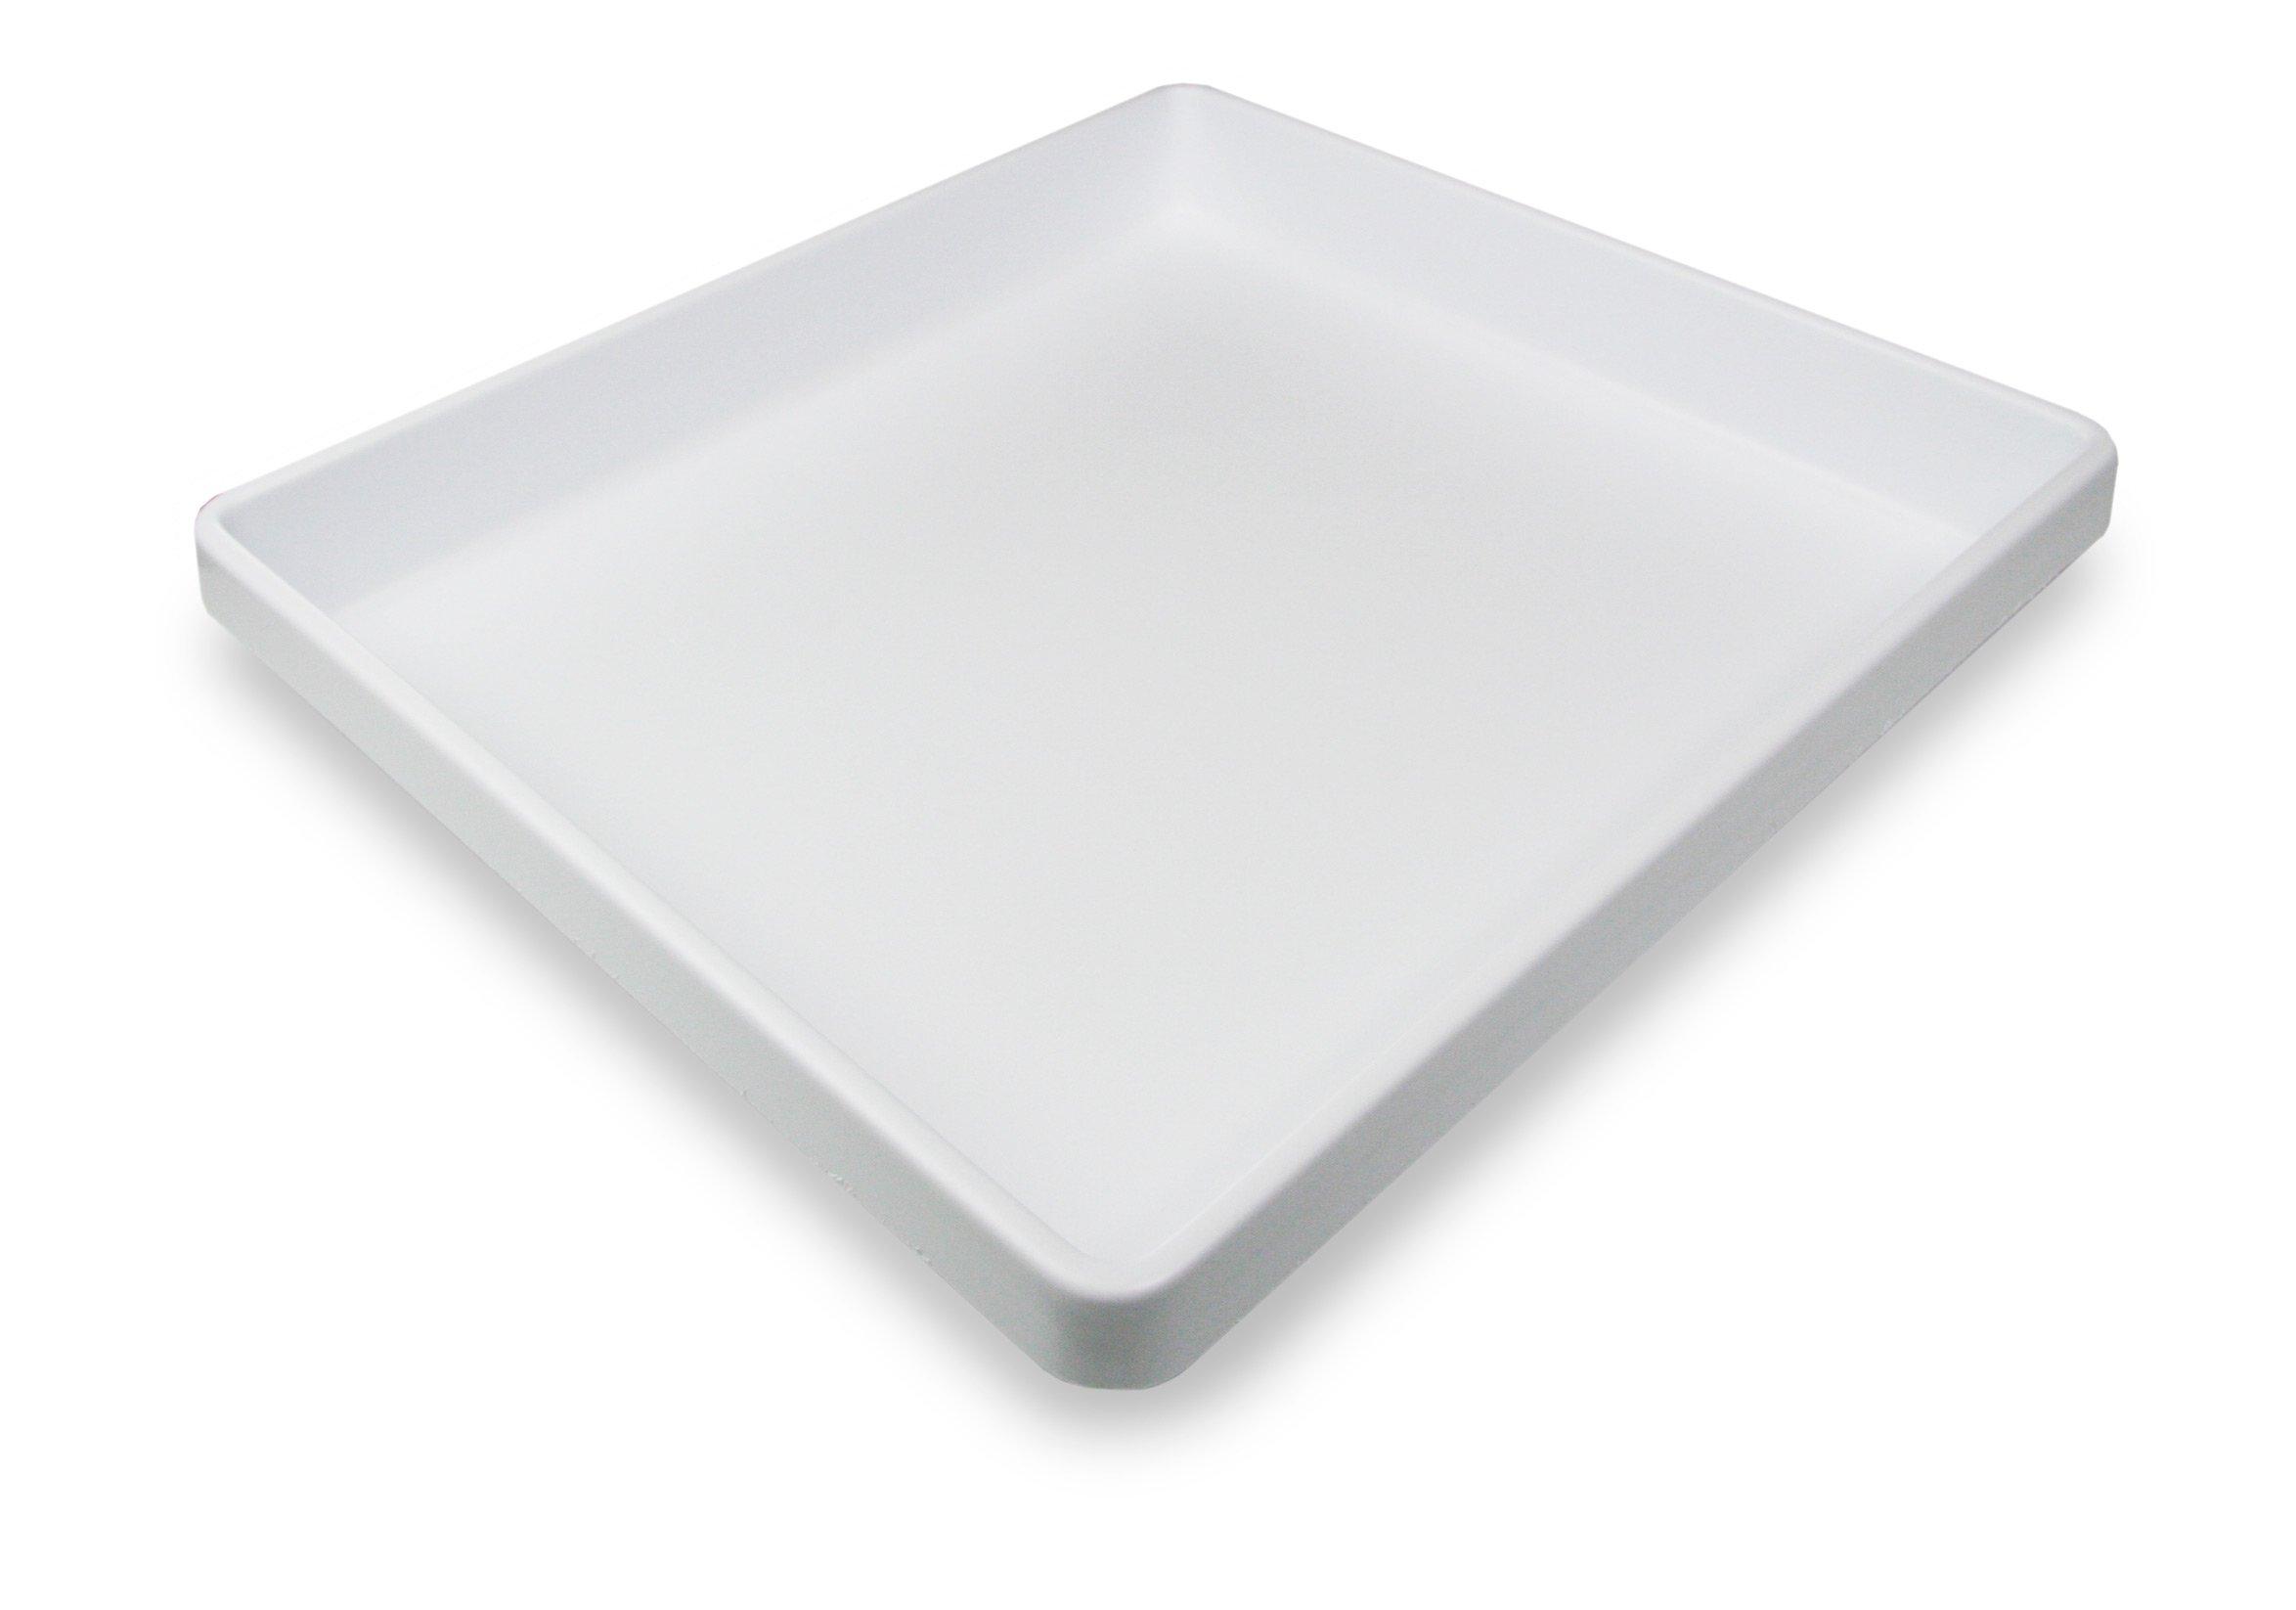 TrippNT 50064 White Polystyrene Plastic Big Drawer Organizer, 1 Compartment, Large, 19'' Width x 2.38'' Height x 17.5'' Depth